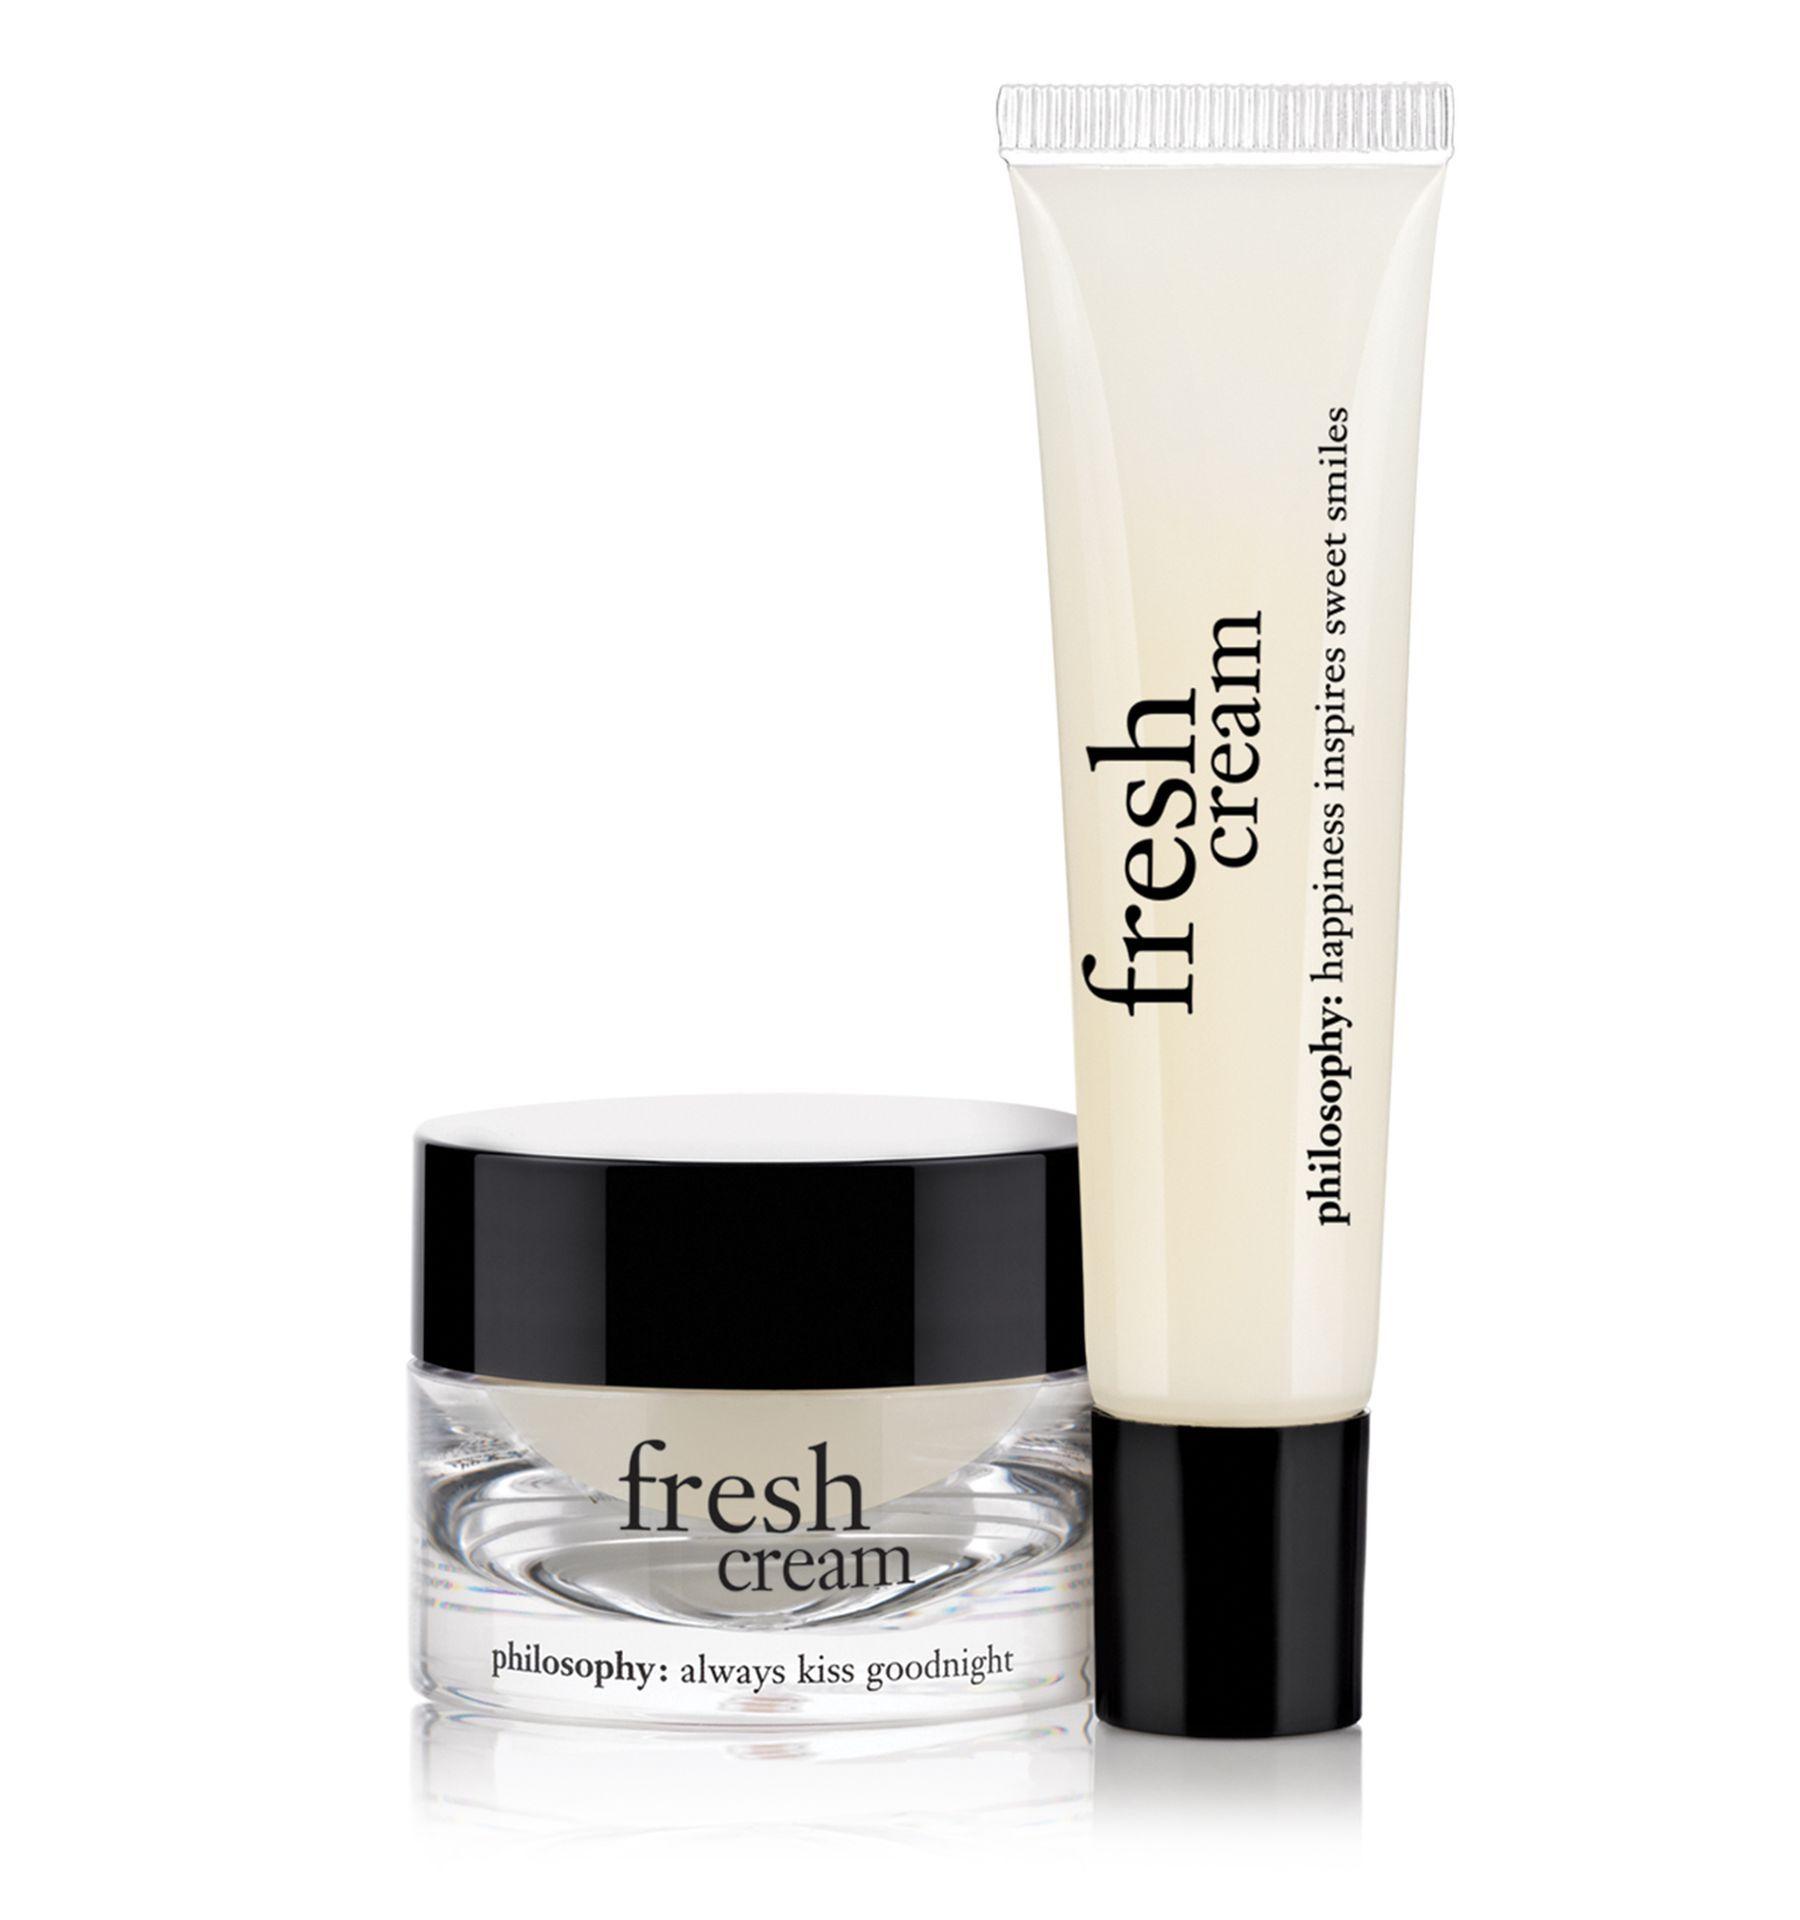 Fresh Cream Lip Duo Philosophy Lip Shines Philosophy Fresh Cream Fresh Cream Philosophy Beauty